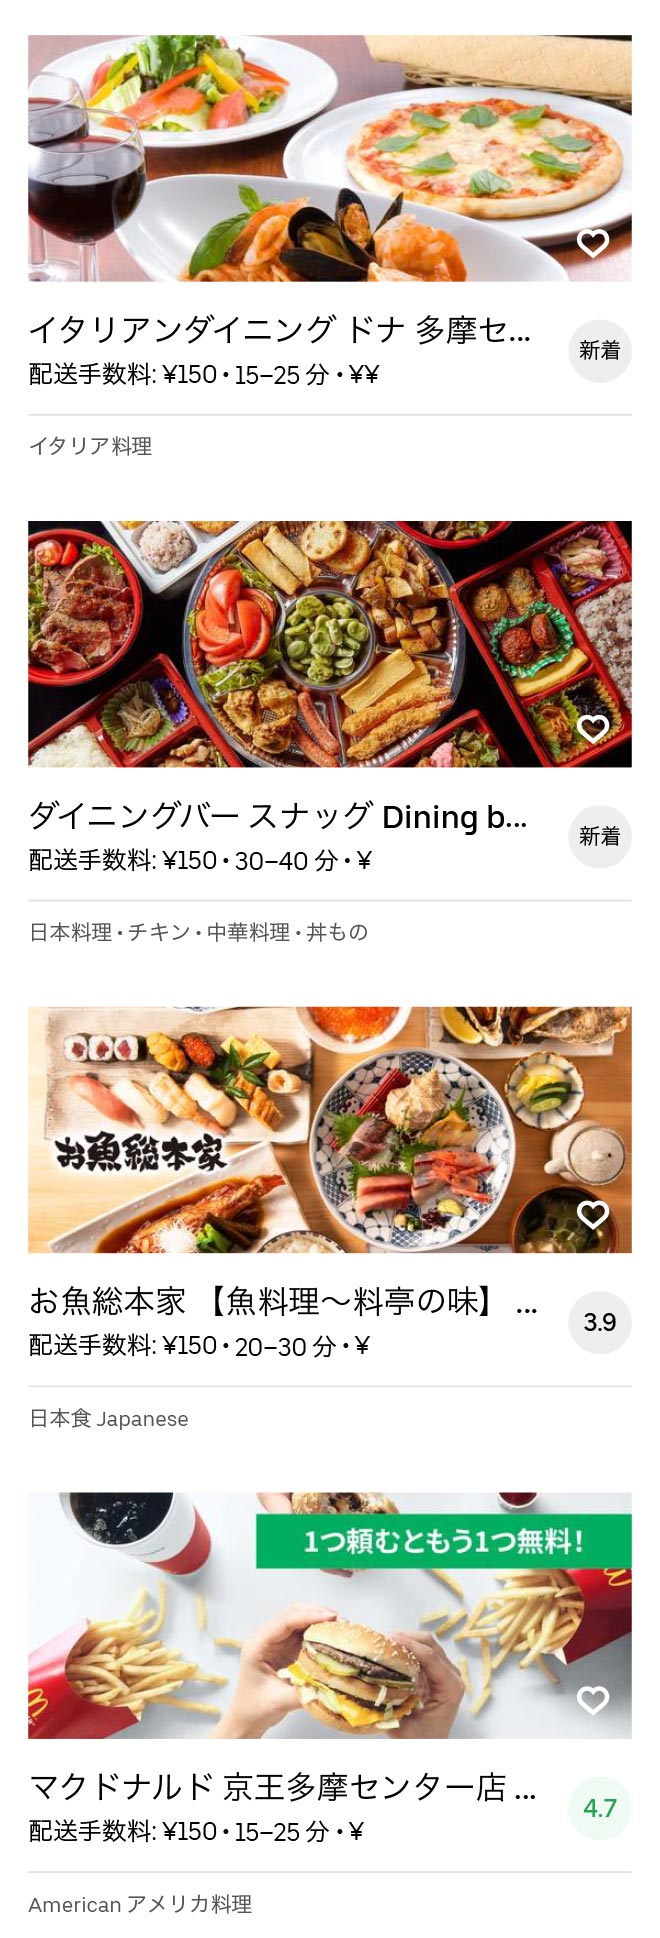 Tama center menu 2007 10